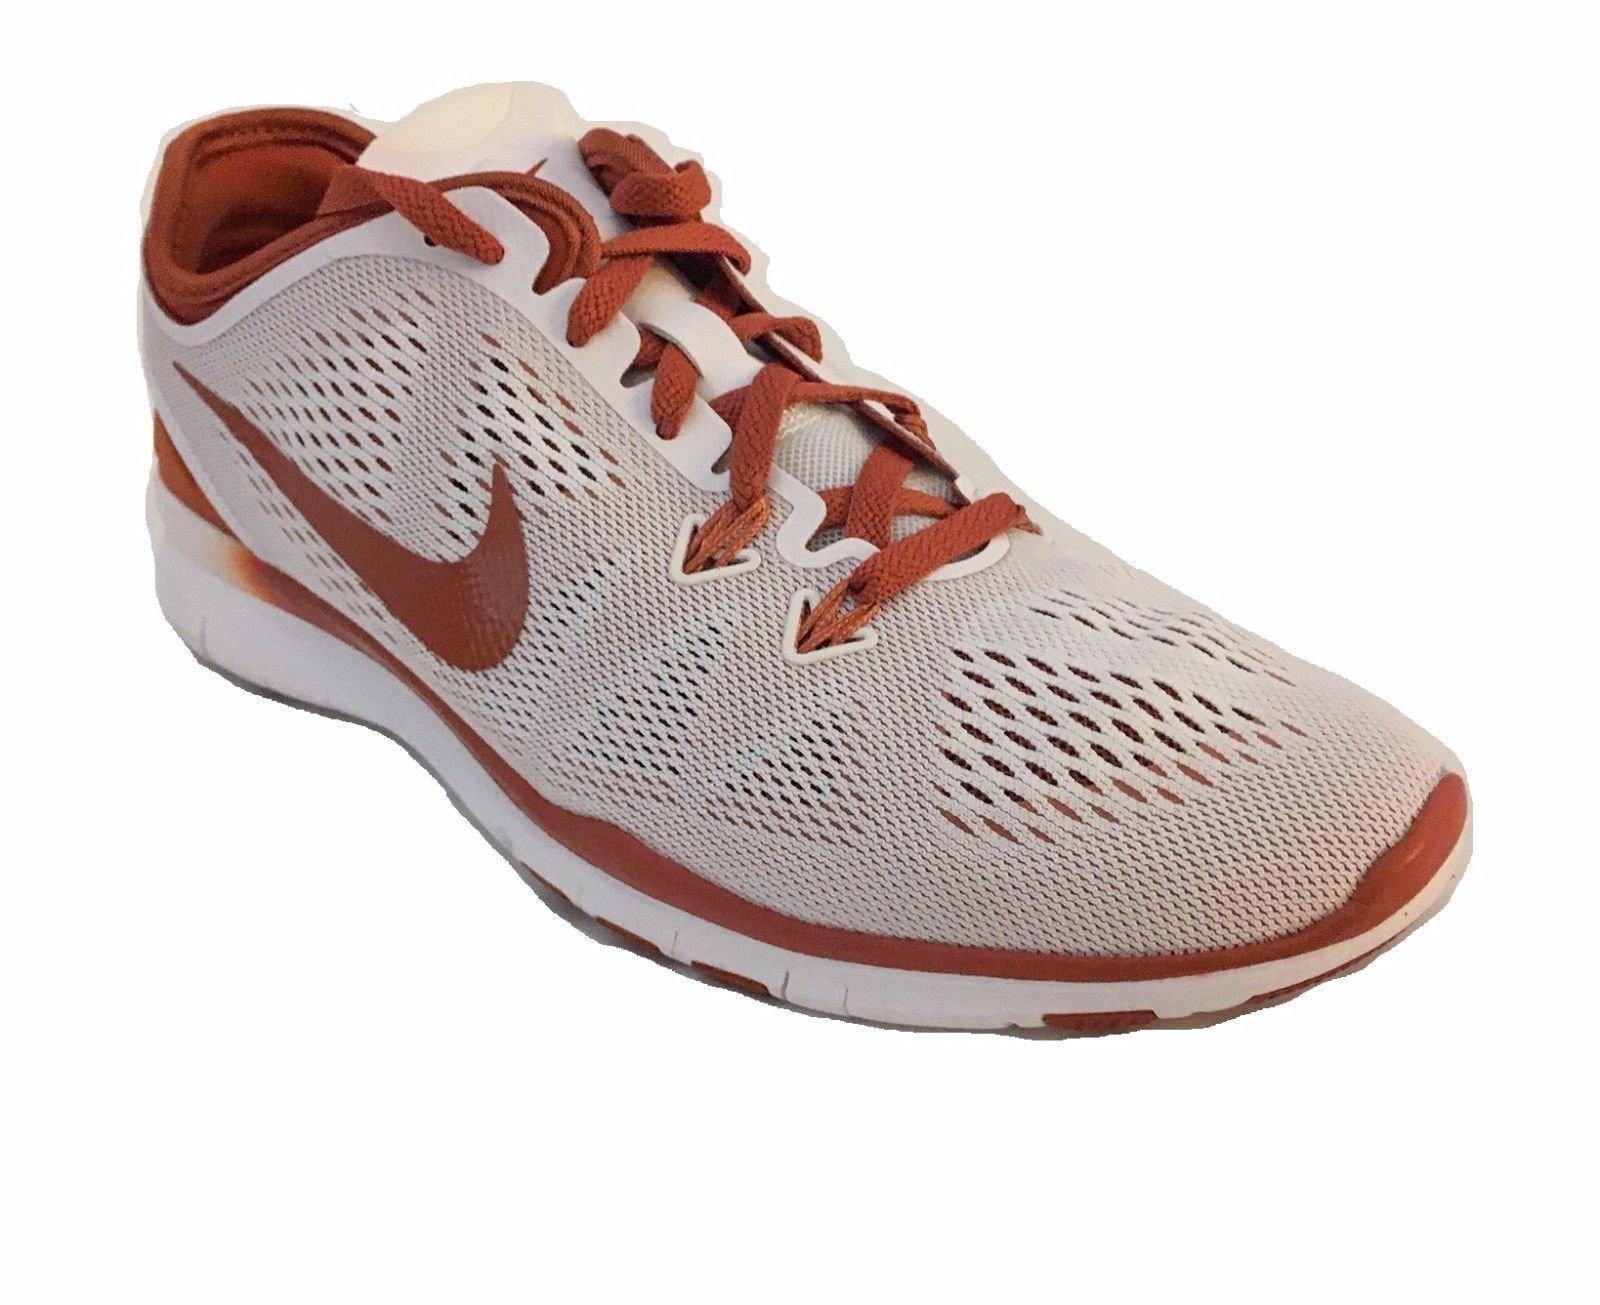 Nike Free 5.0 Tr Fit 5 Women US 10.5 White Cross Training